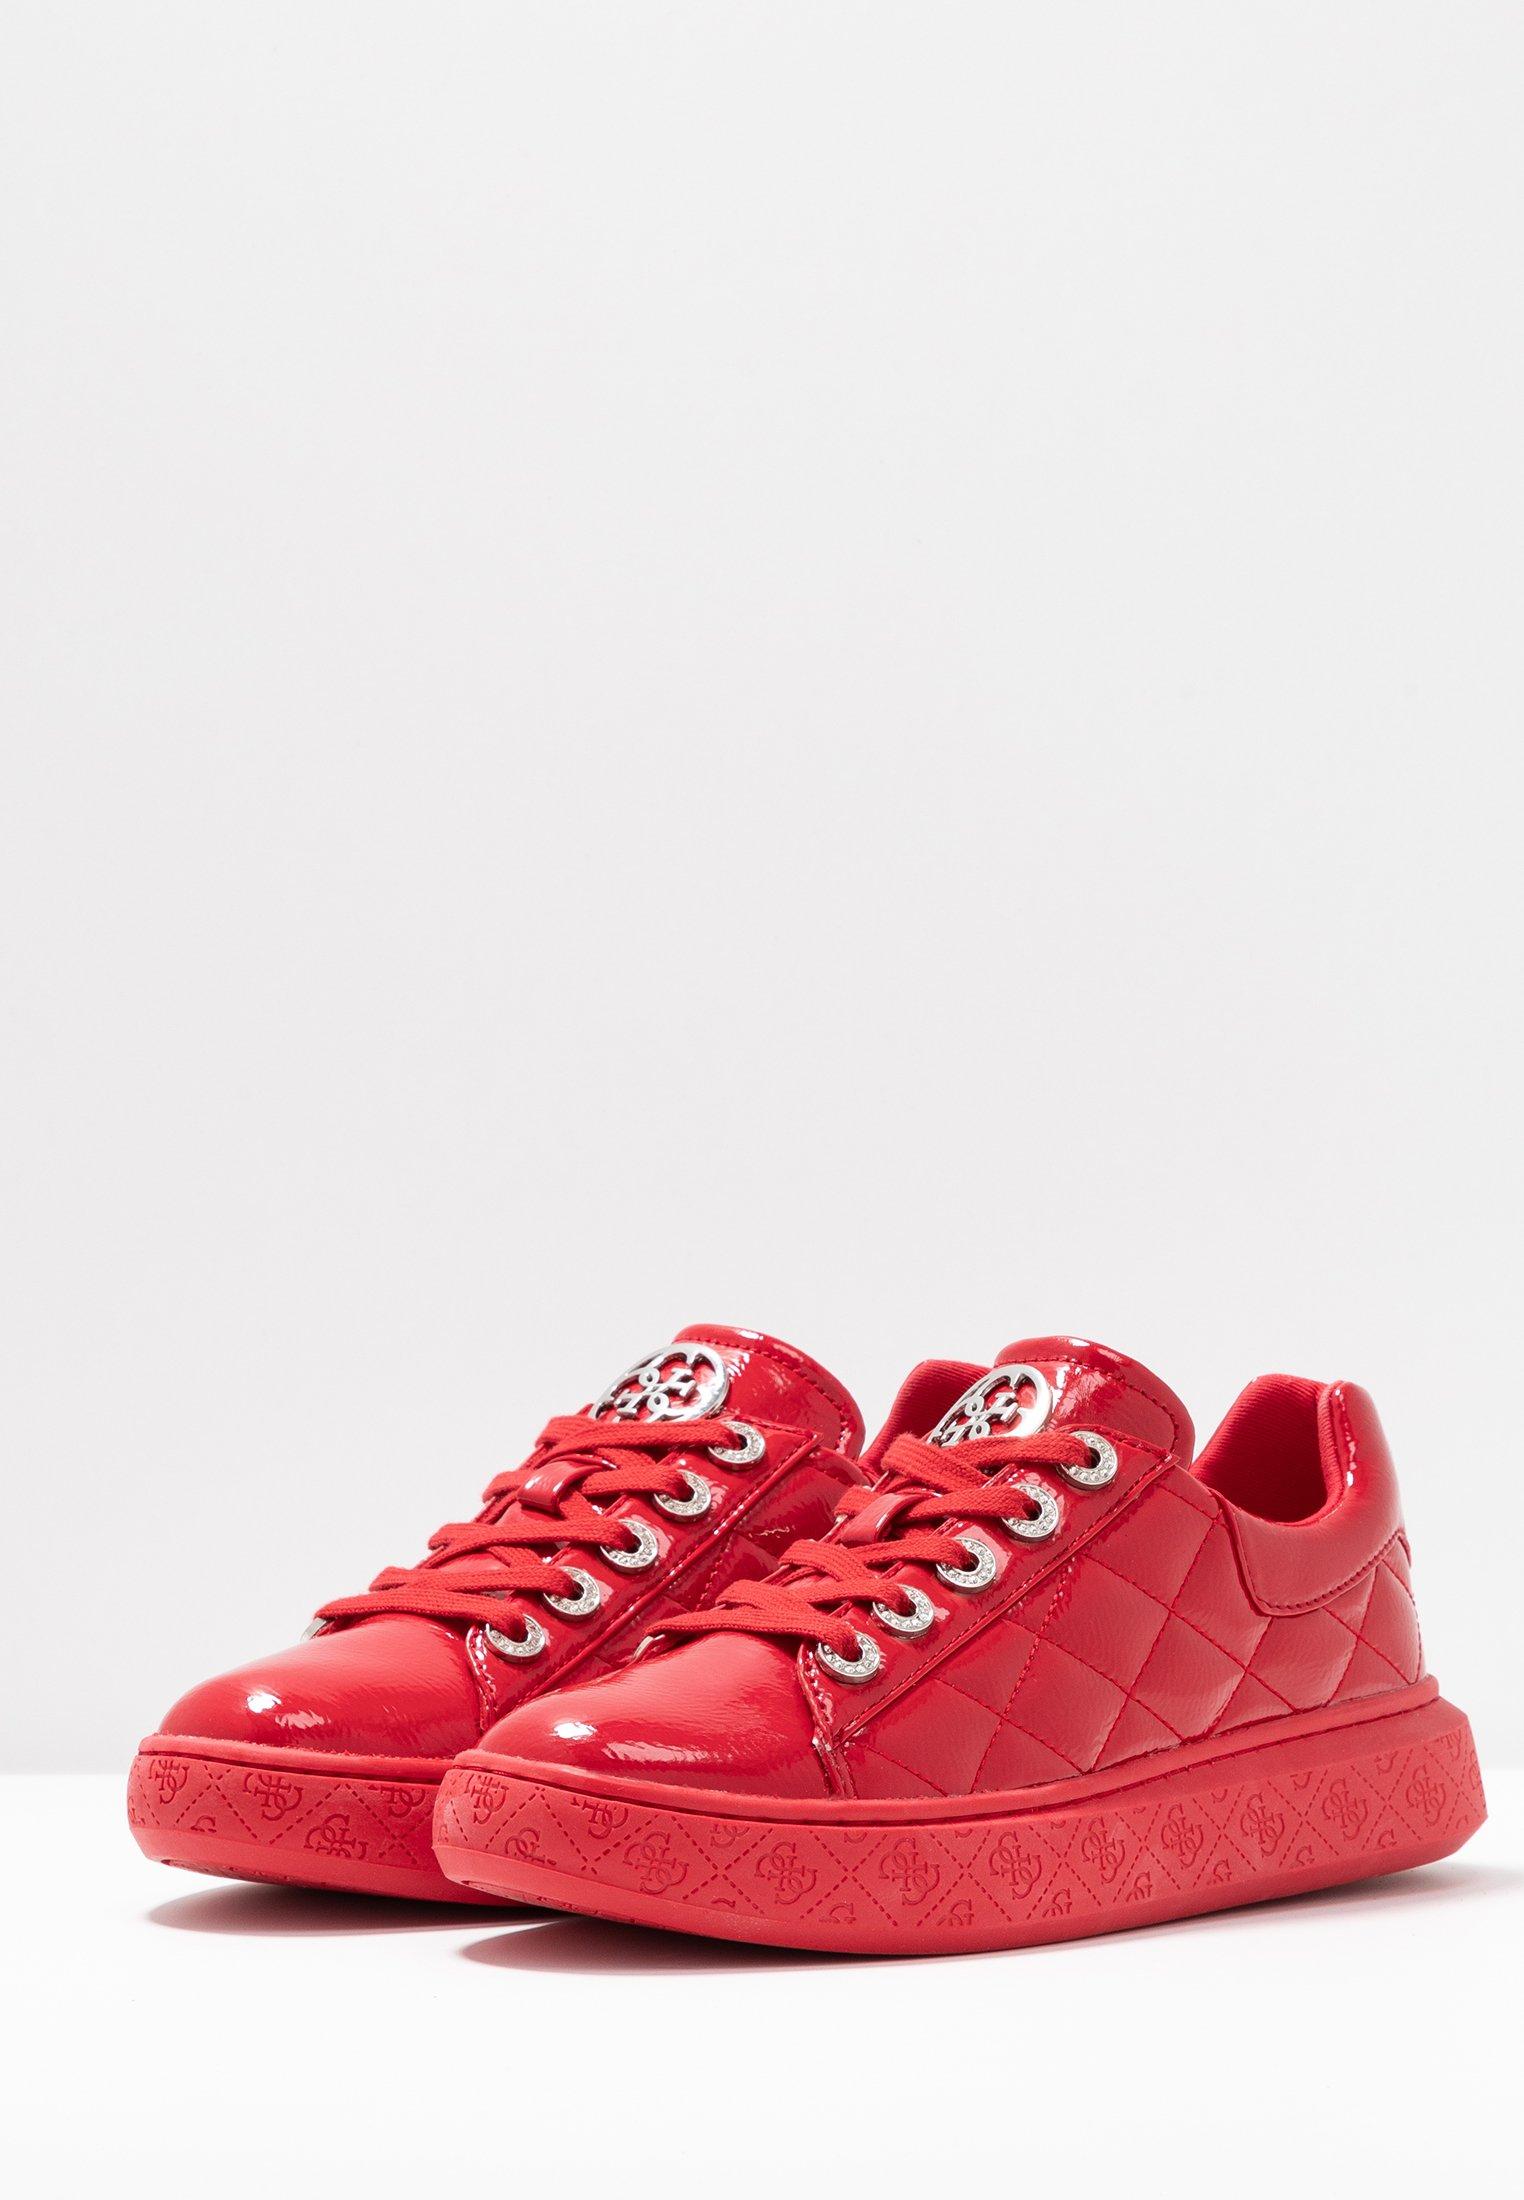 Guess BECKS - Sneaker low red